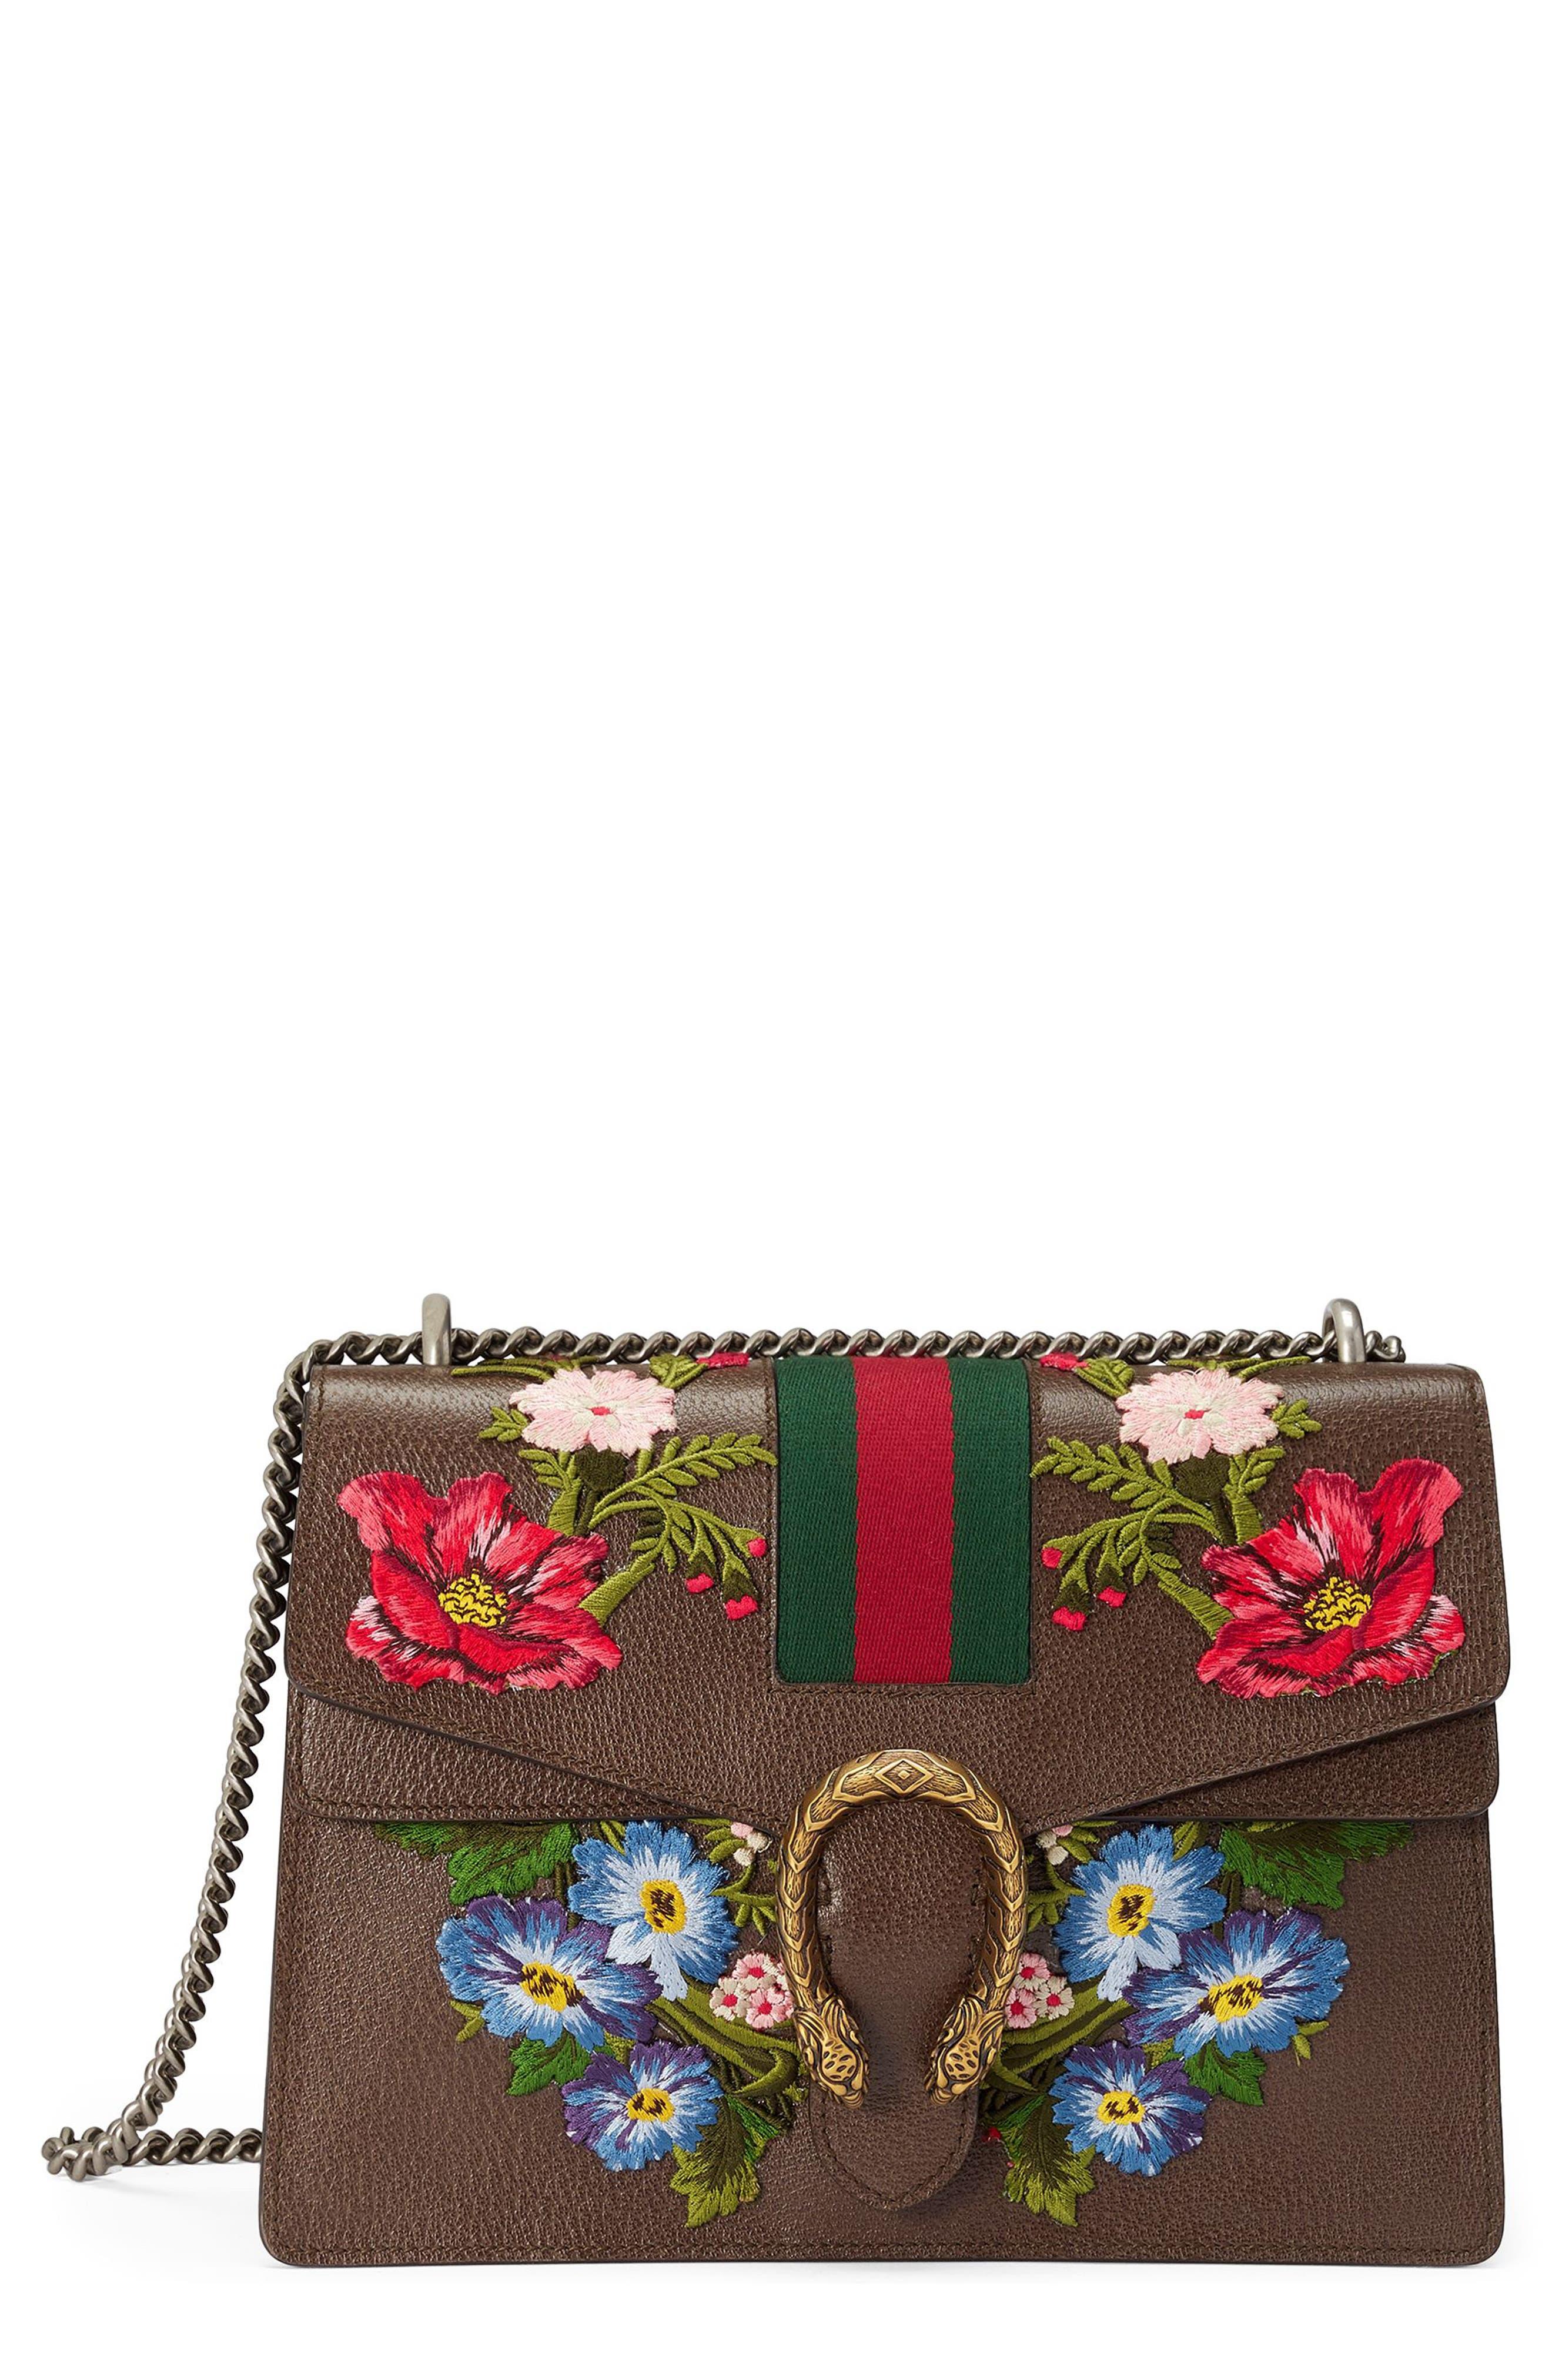 Medium Dionysus Embroidered Leather Shoulder Bag,                             Main thumbnail 1, color,                             031